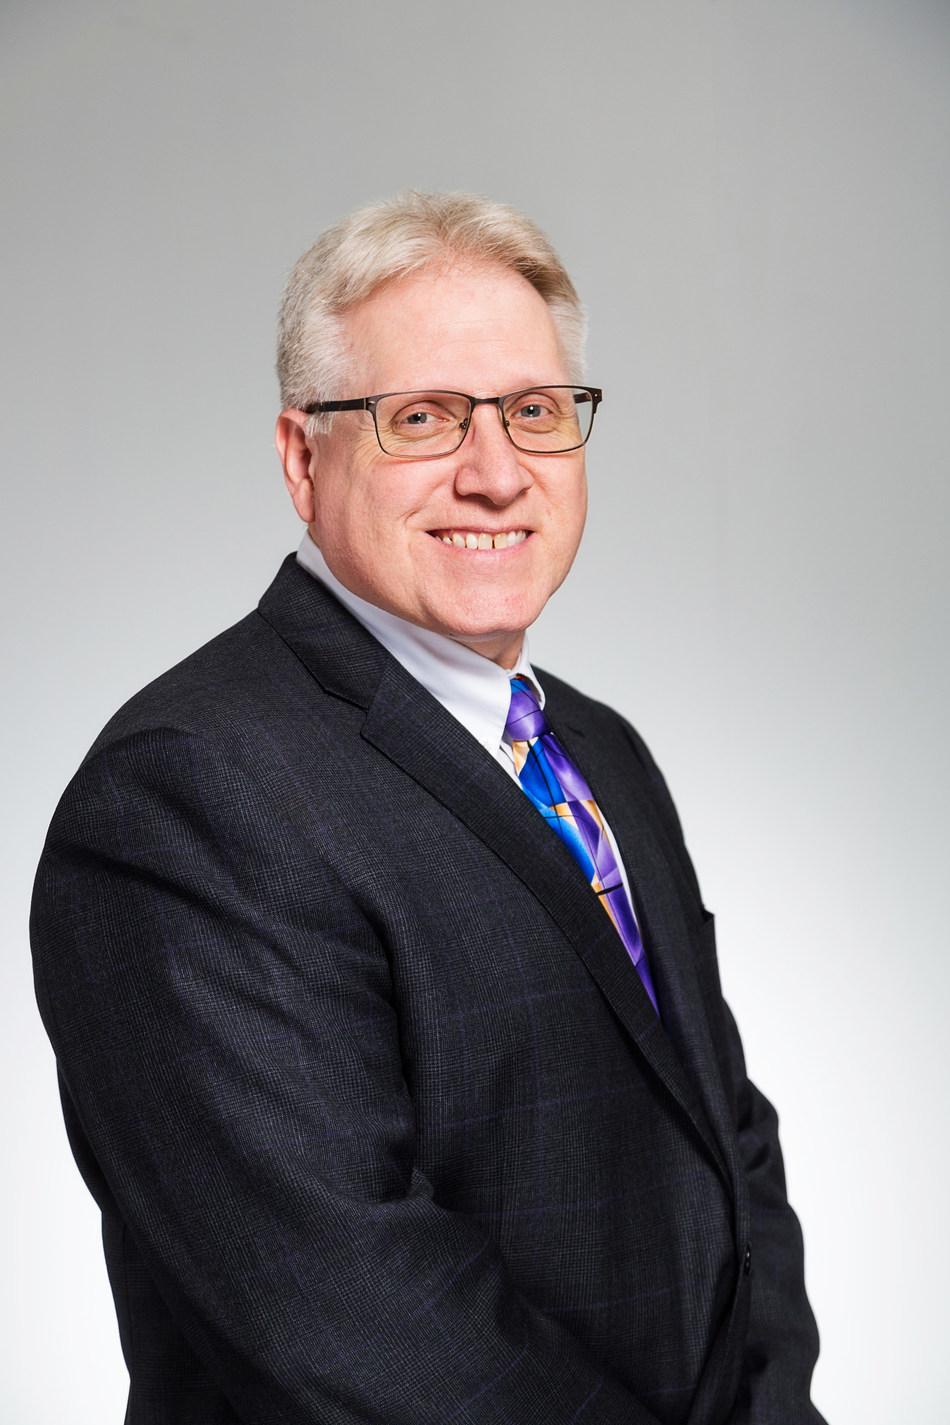 Sunrise House Treatment Center CEO